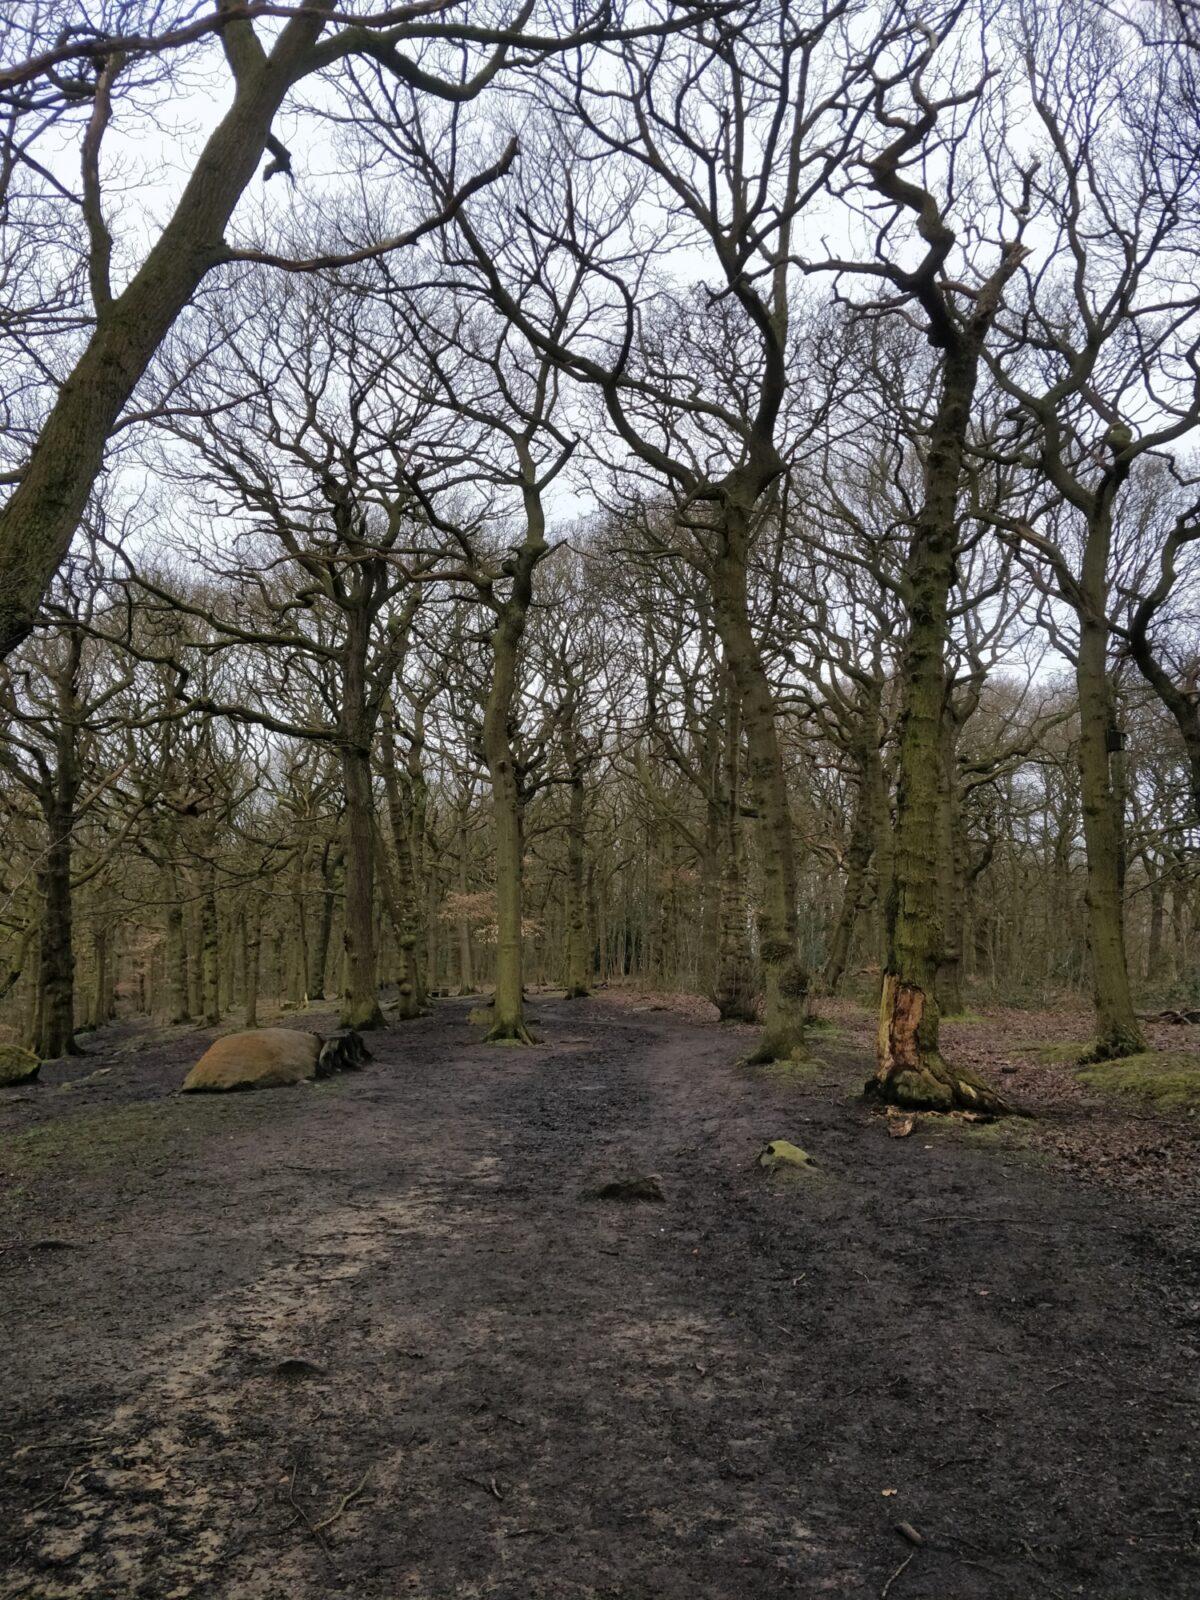 Northcliffe Woods, Shipley large photo 4